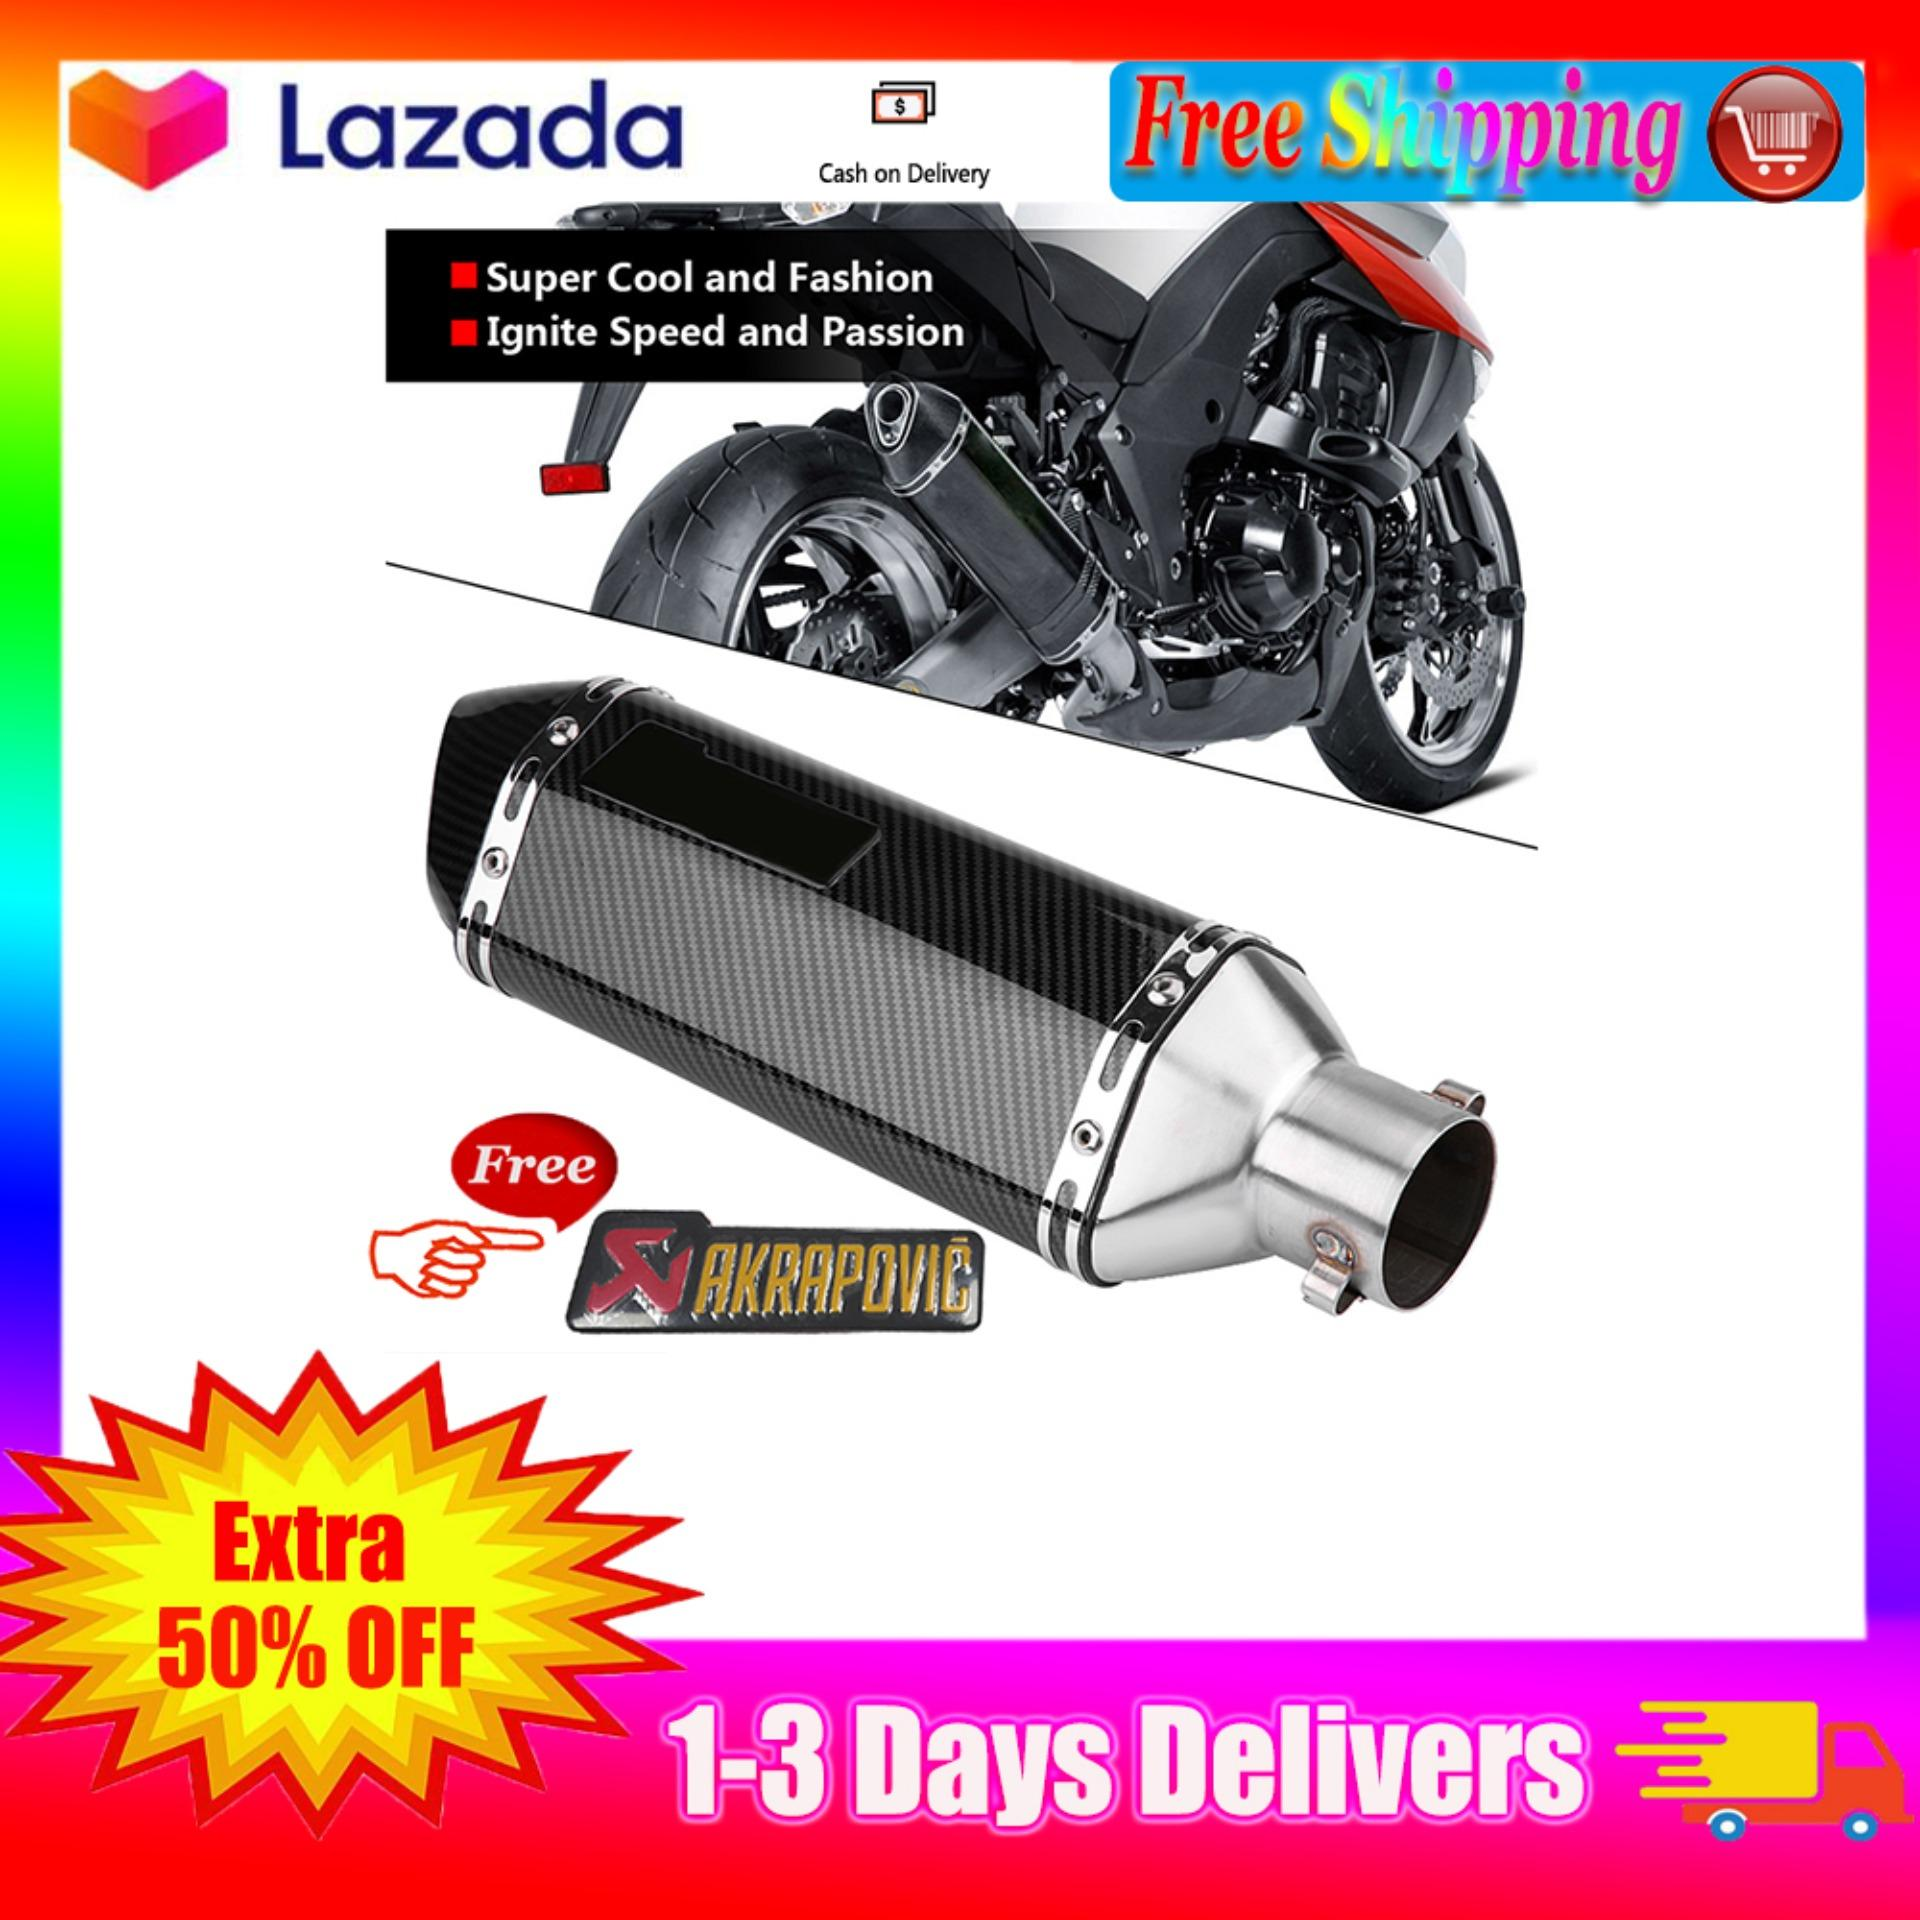 【Free Shipping】QigngYun Professional Motorcycle Racing Bicycle Full Exhaust  System Muffler Tailpipe Rear Pipe for Honda Yamaha Suzuki Kawasaki and